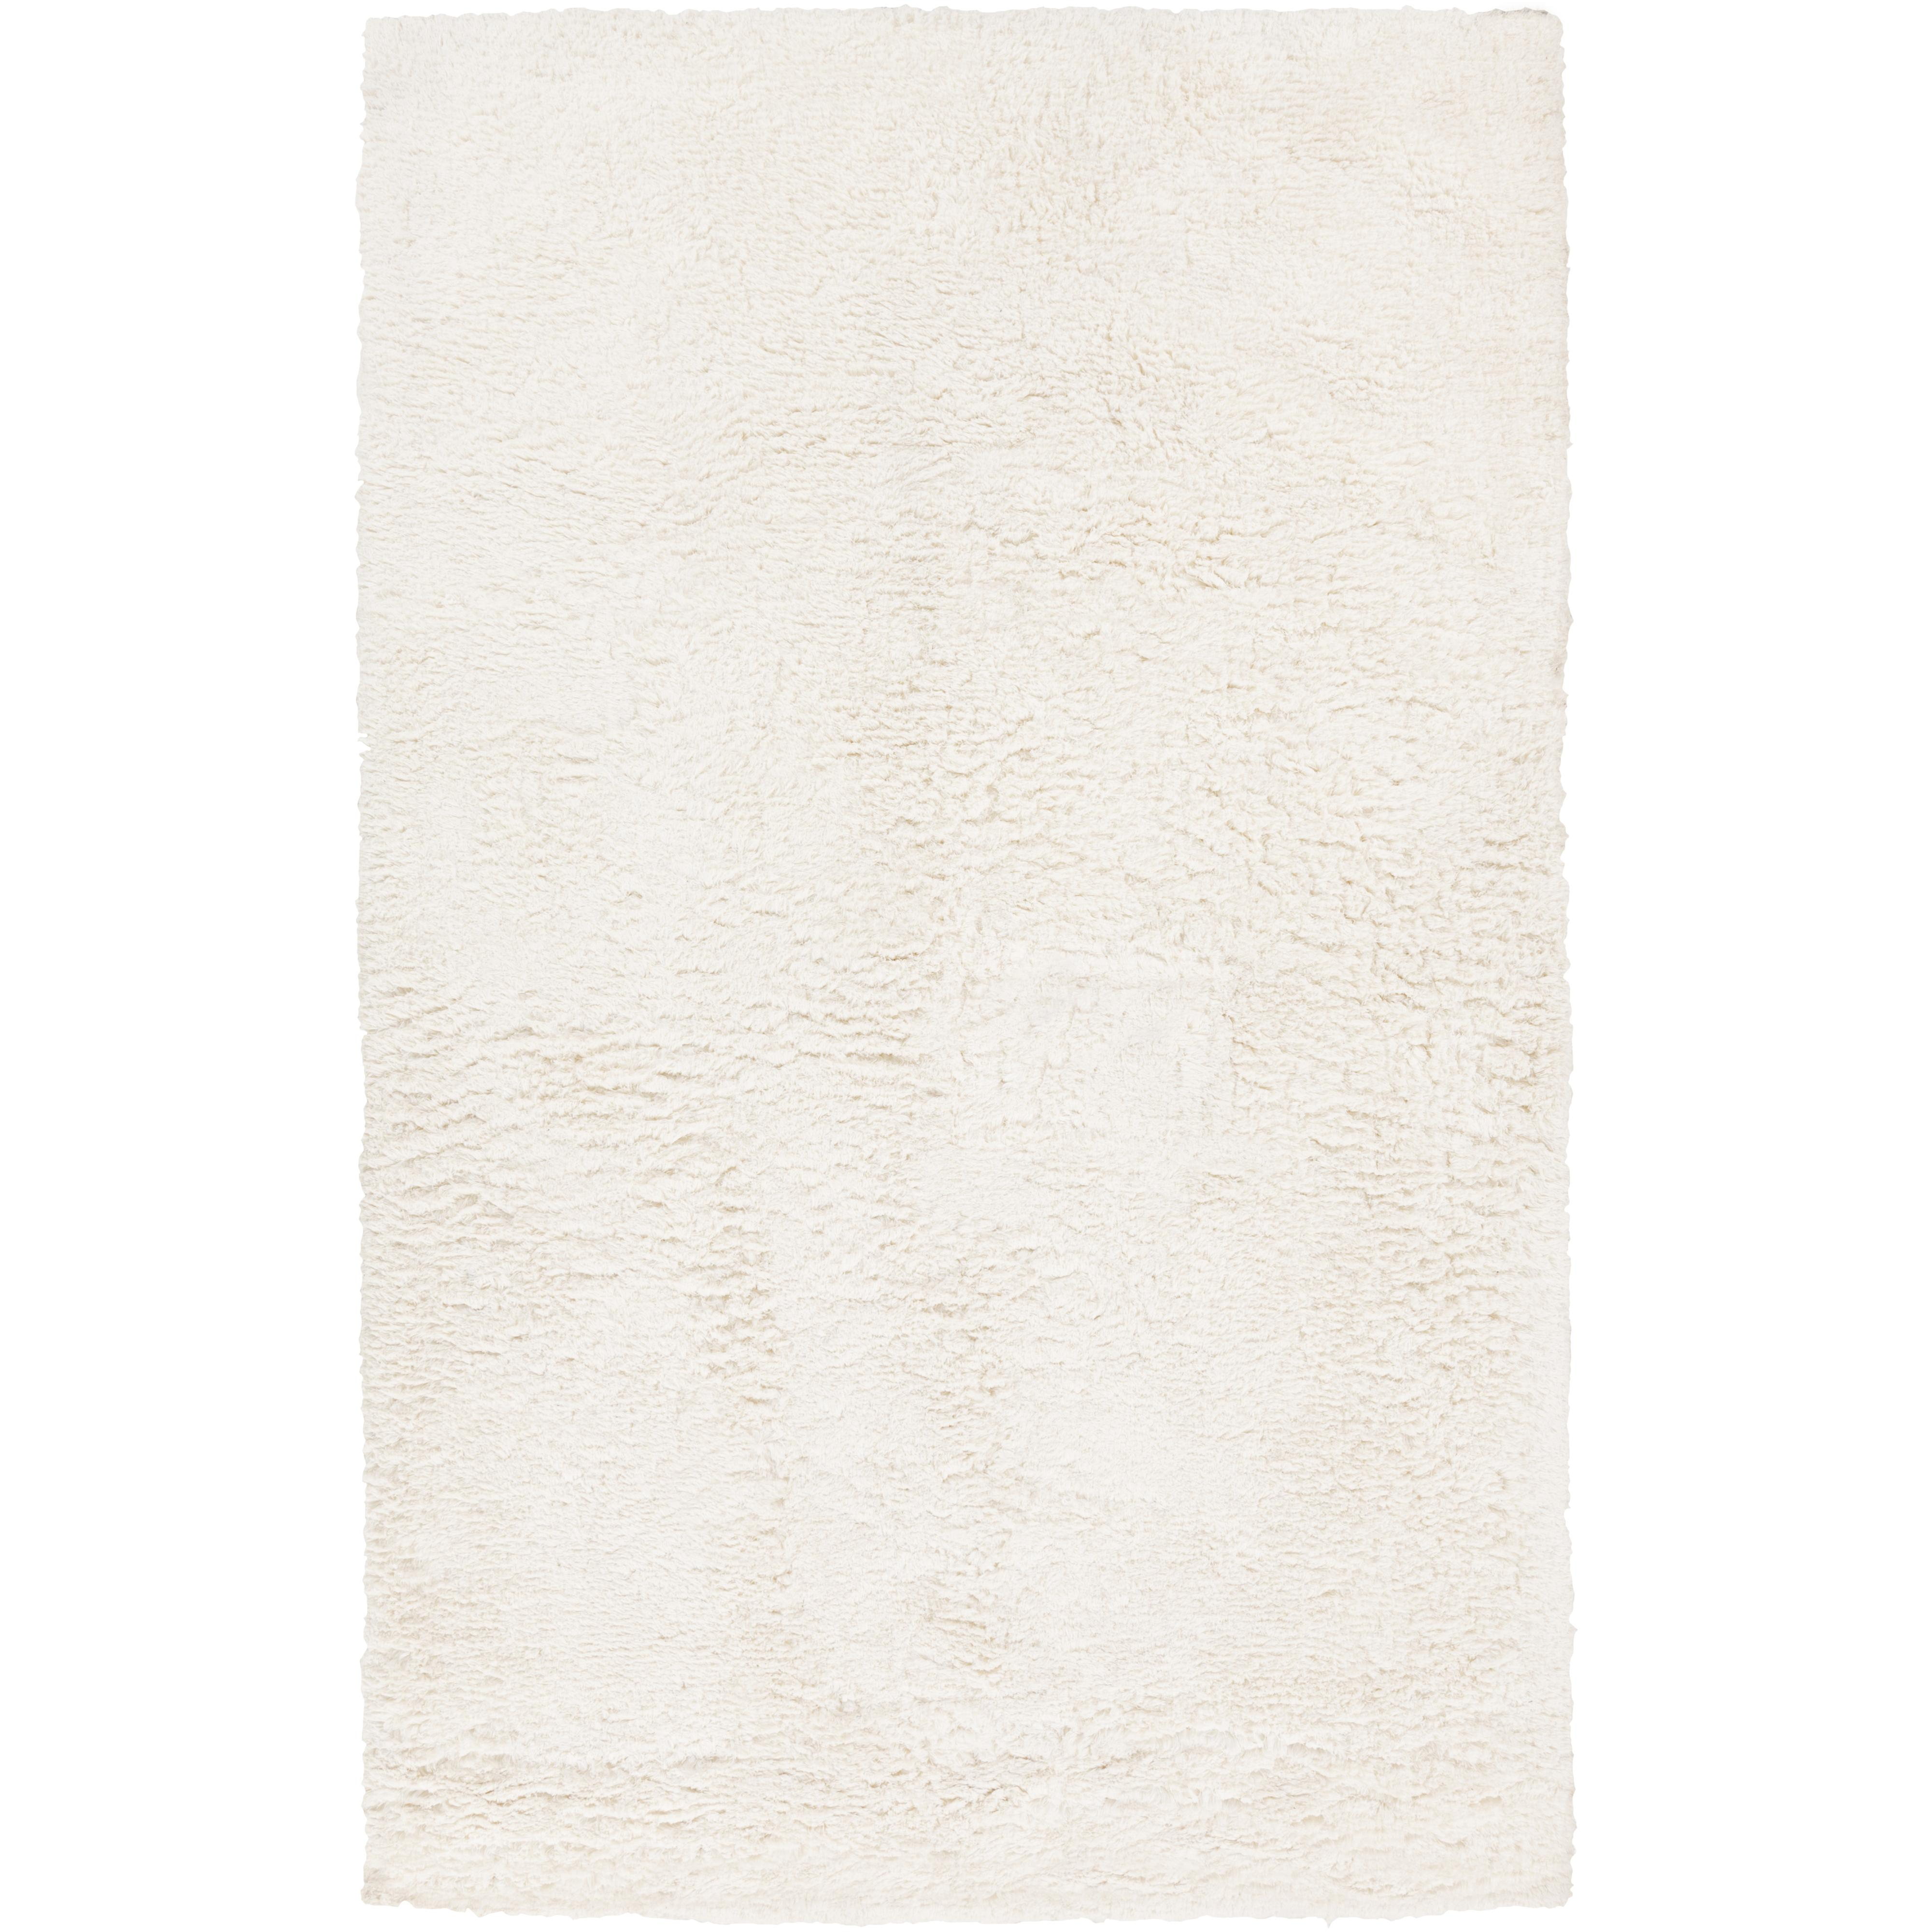 "Surya Rugs Pado 5' x 7'6"" - Item Number: PAD1000-576"